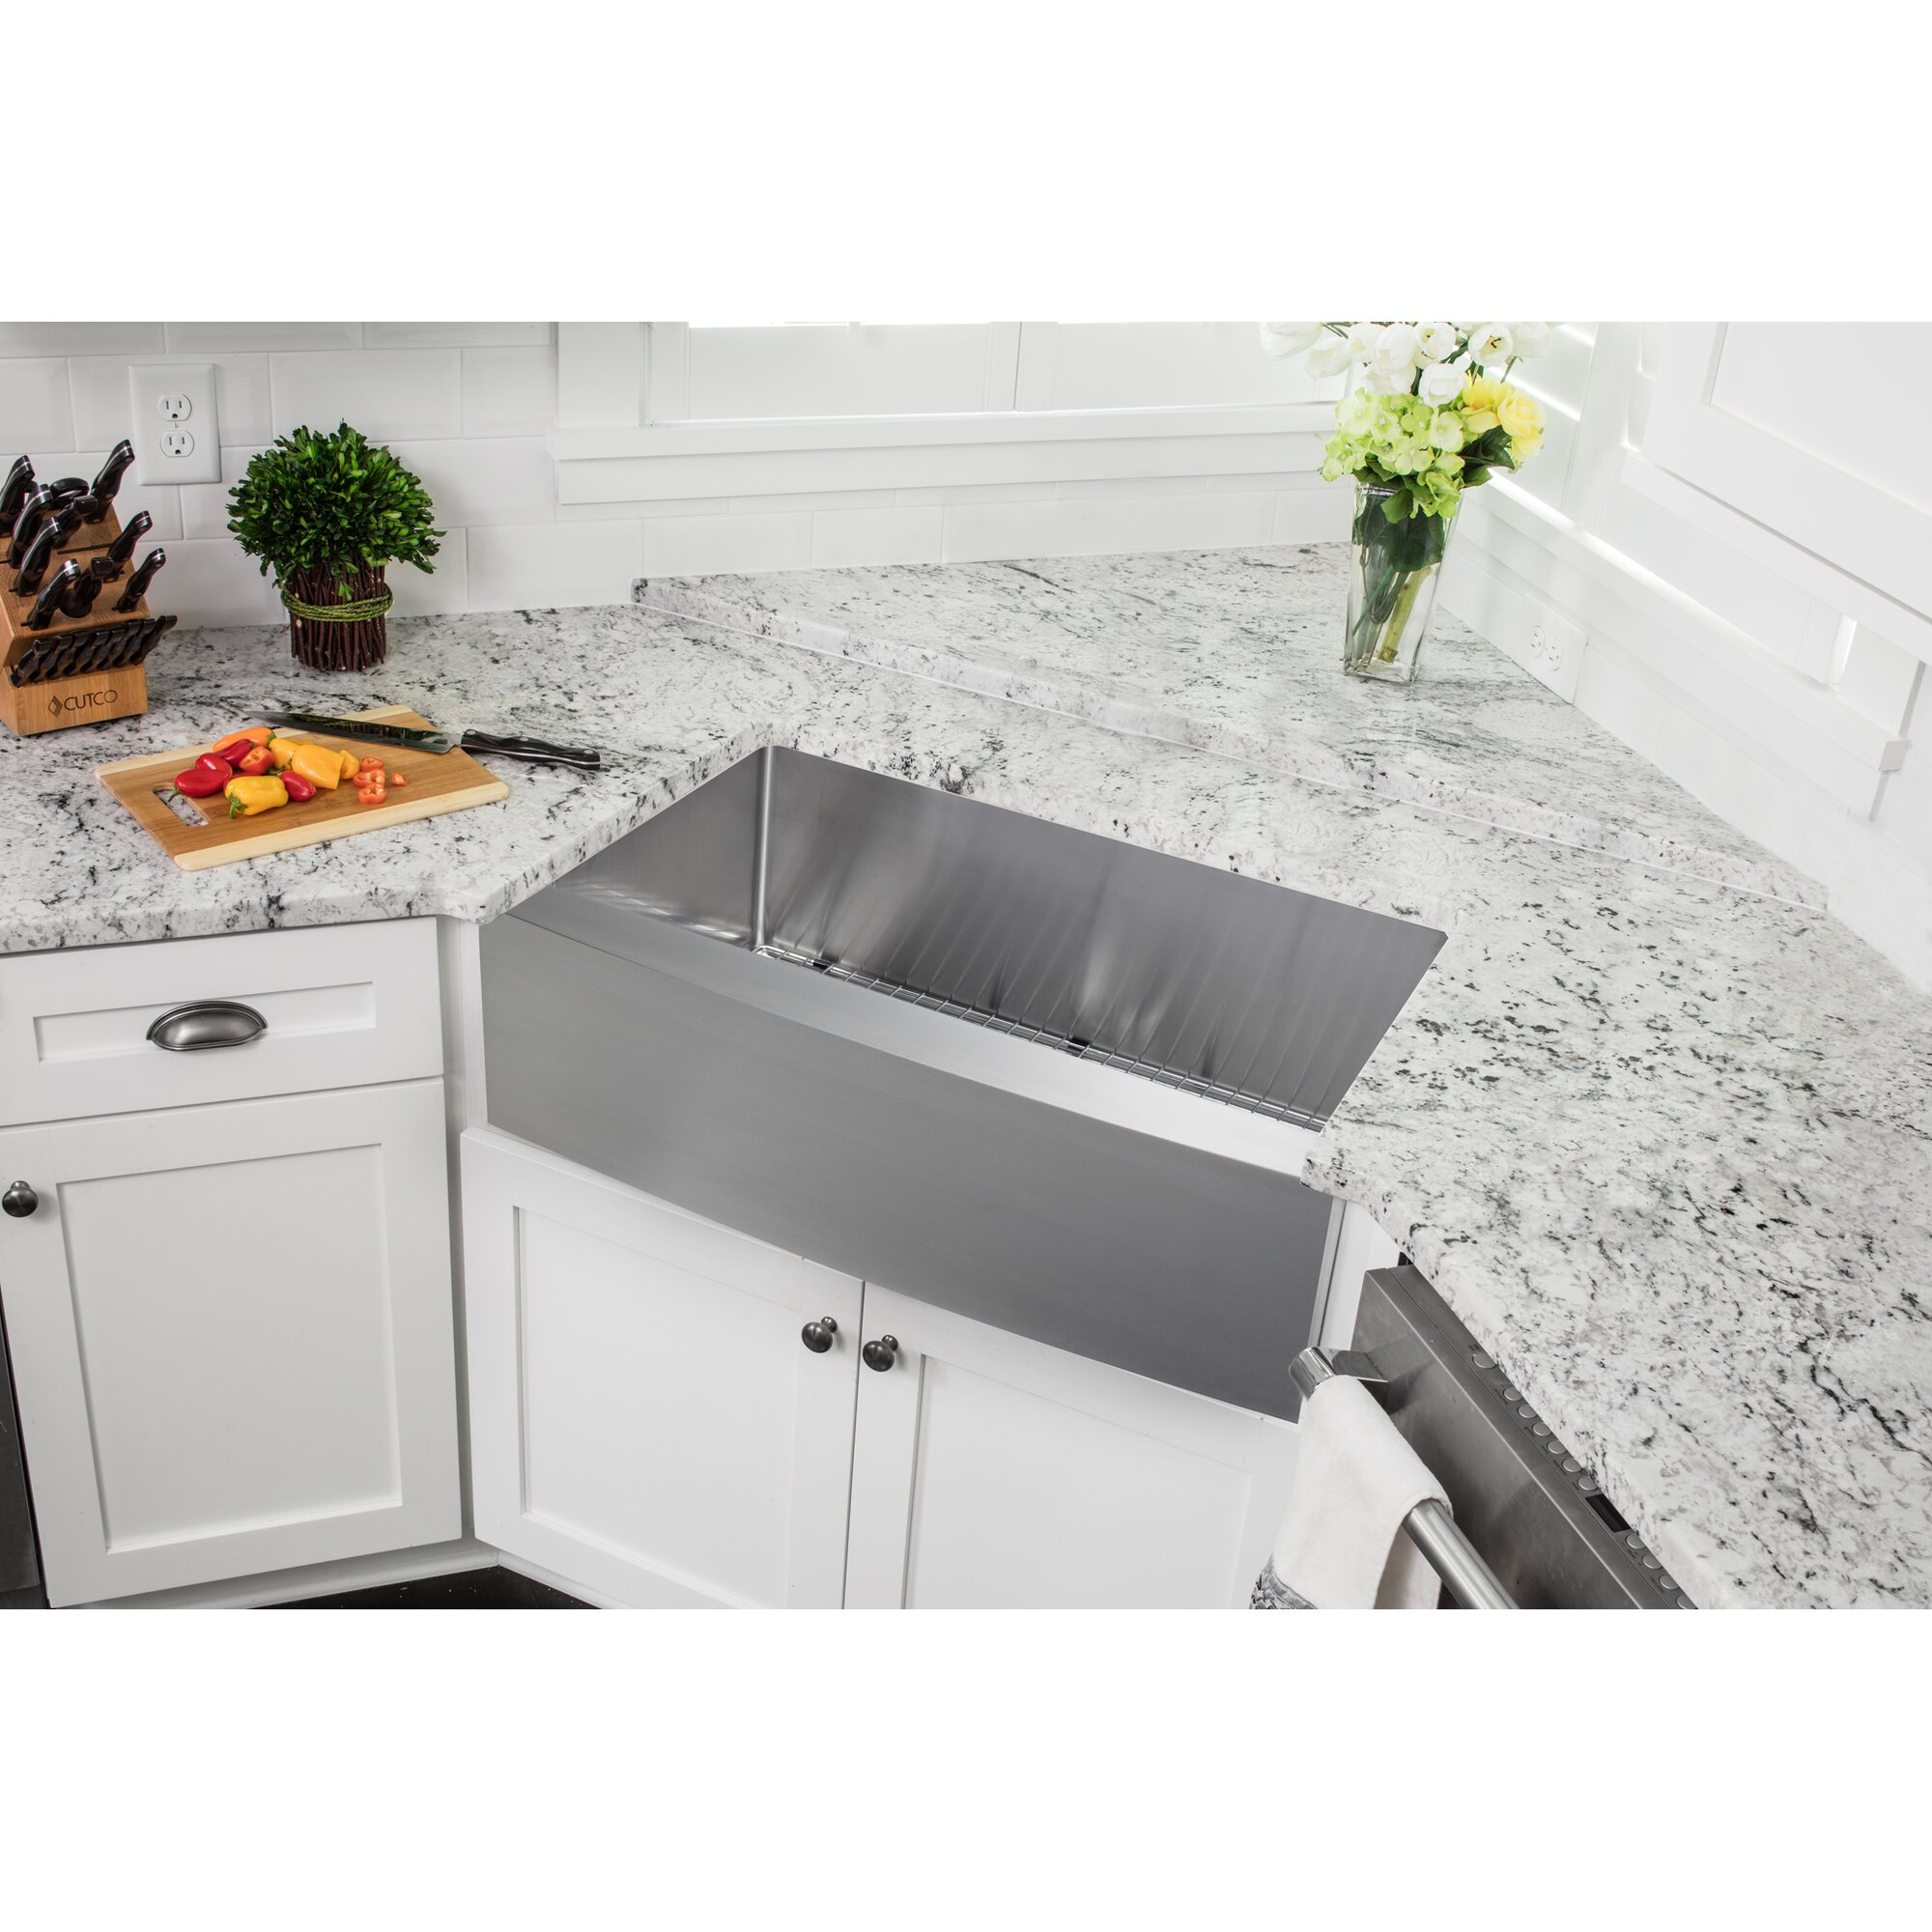 35875 x 2075 single bowl farmhouseapron kitchen sink - Apron Kitchen Sinks